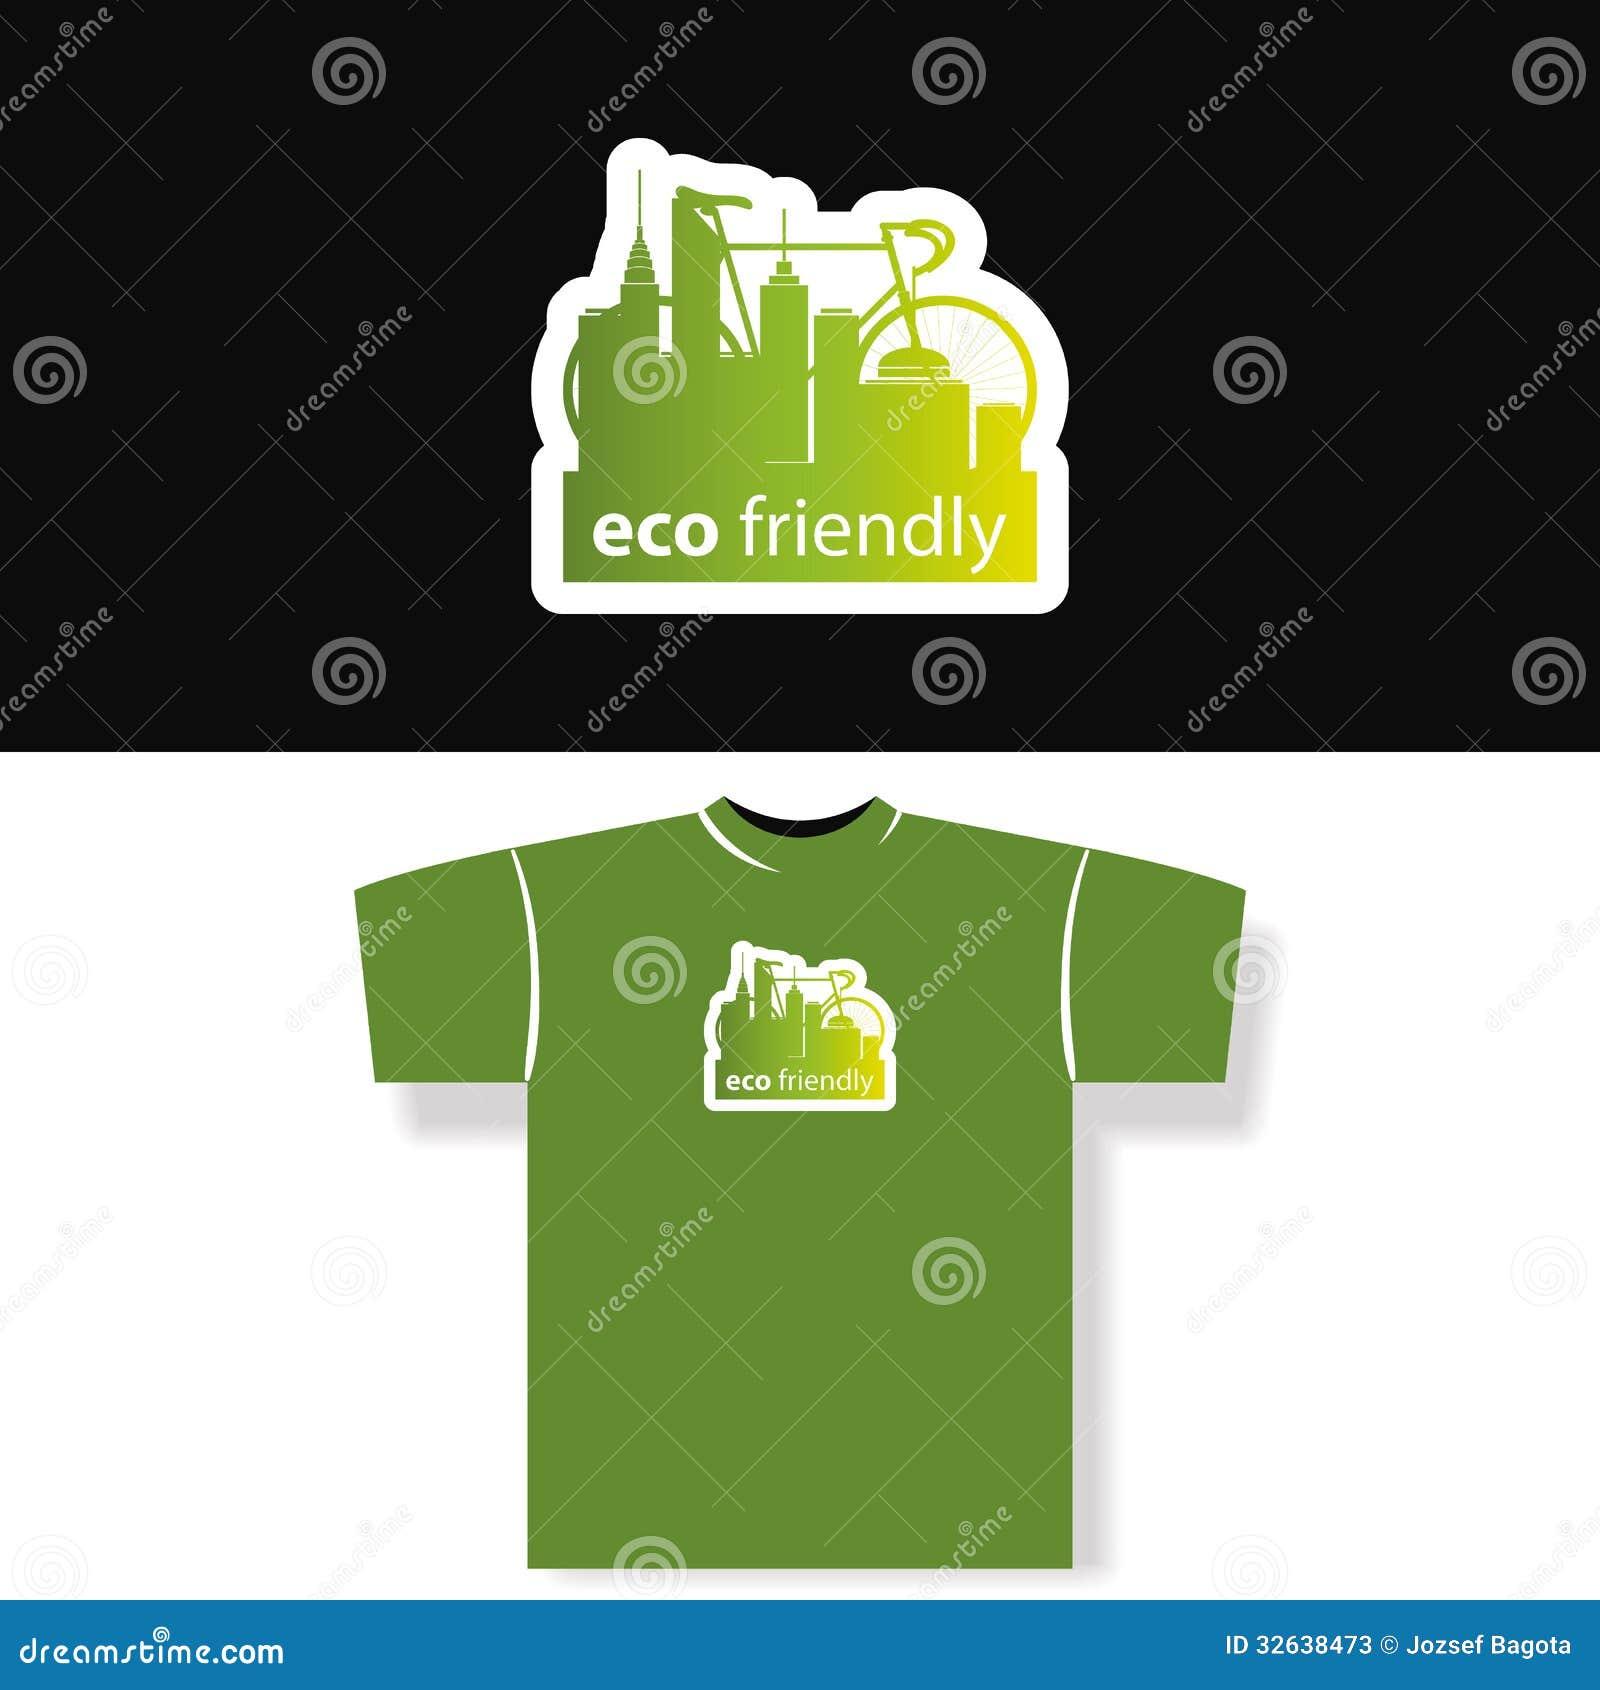 Shirt design green - Eco Friendly T Shirt Design